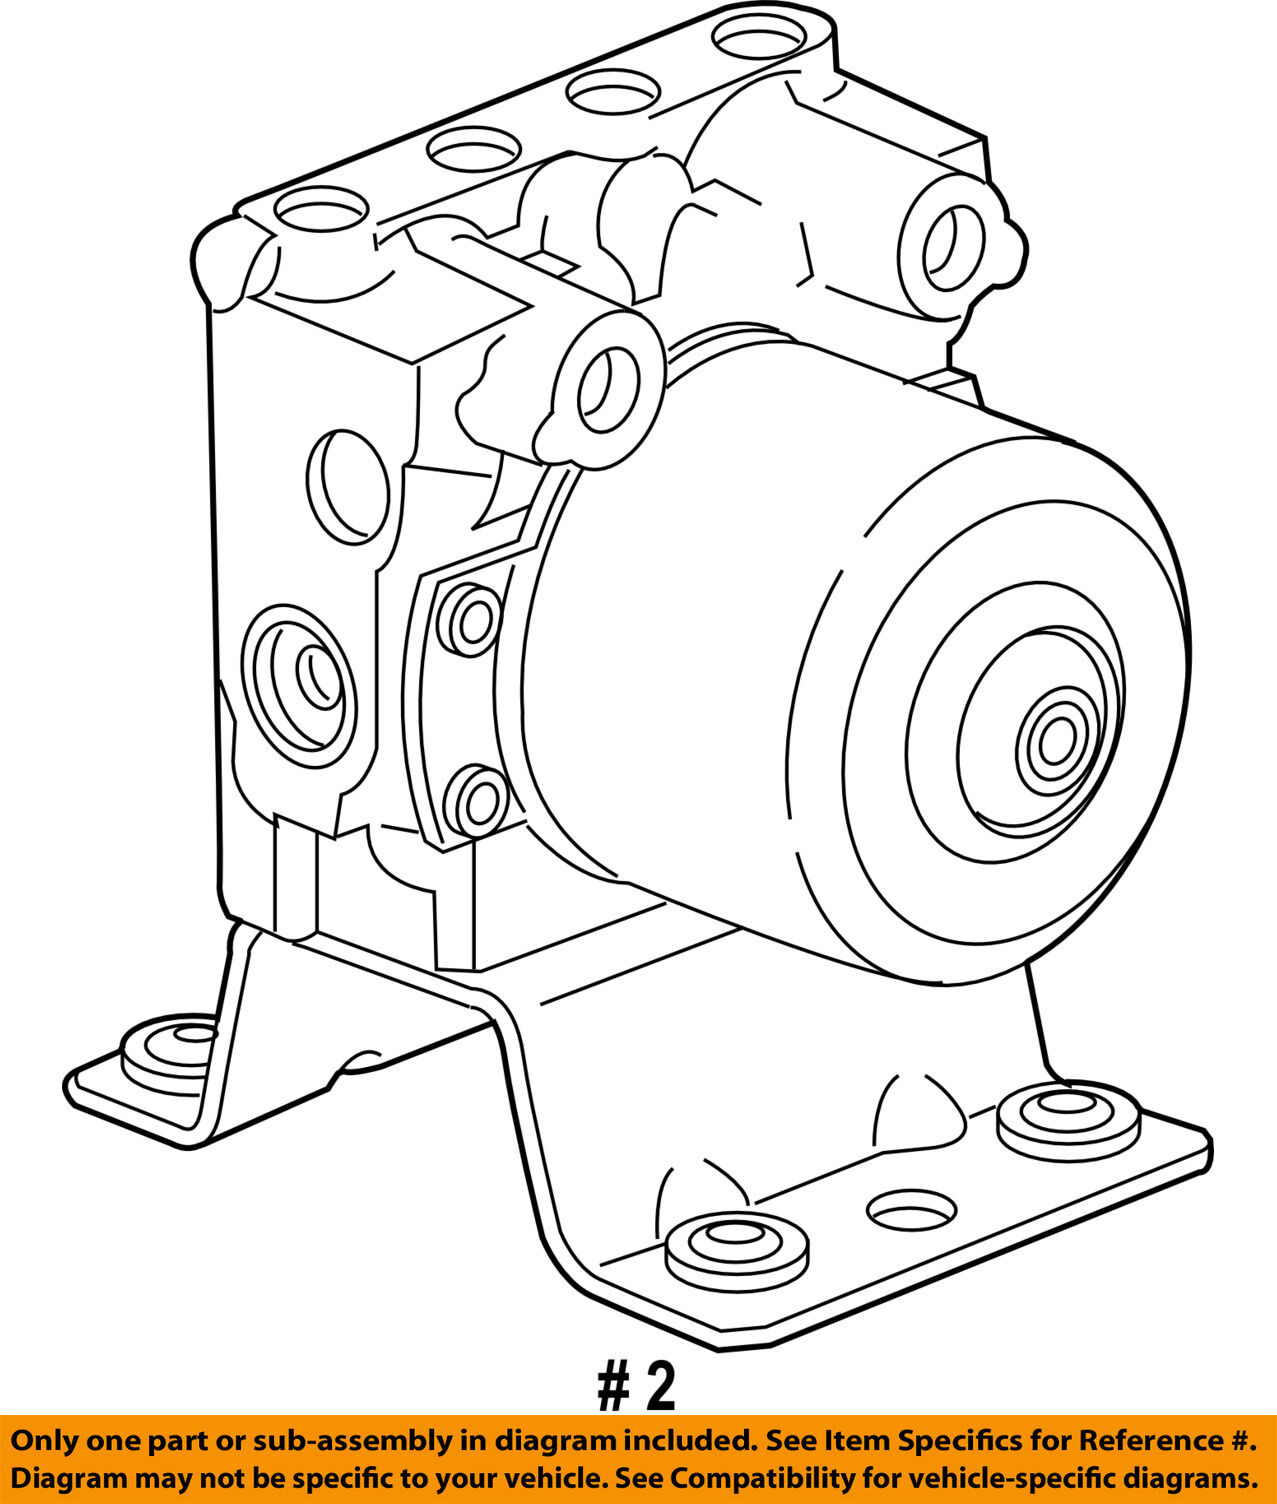 Gm Oem Abs Anti Lock Brakes Modulator Valve 25818716 For Sale Diagram